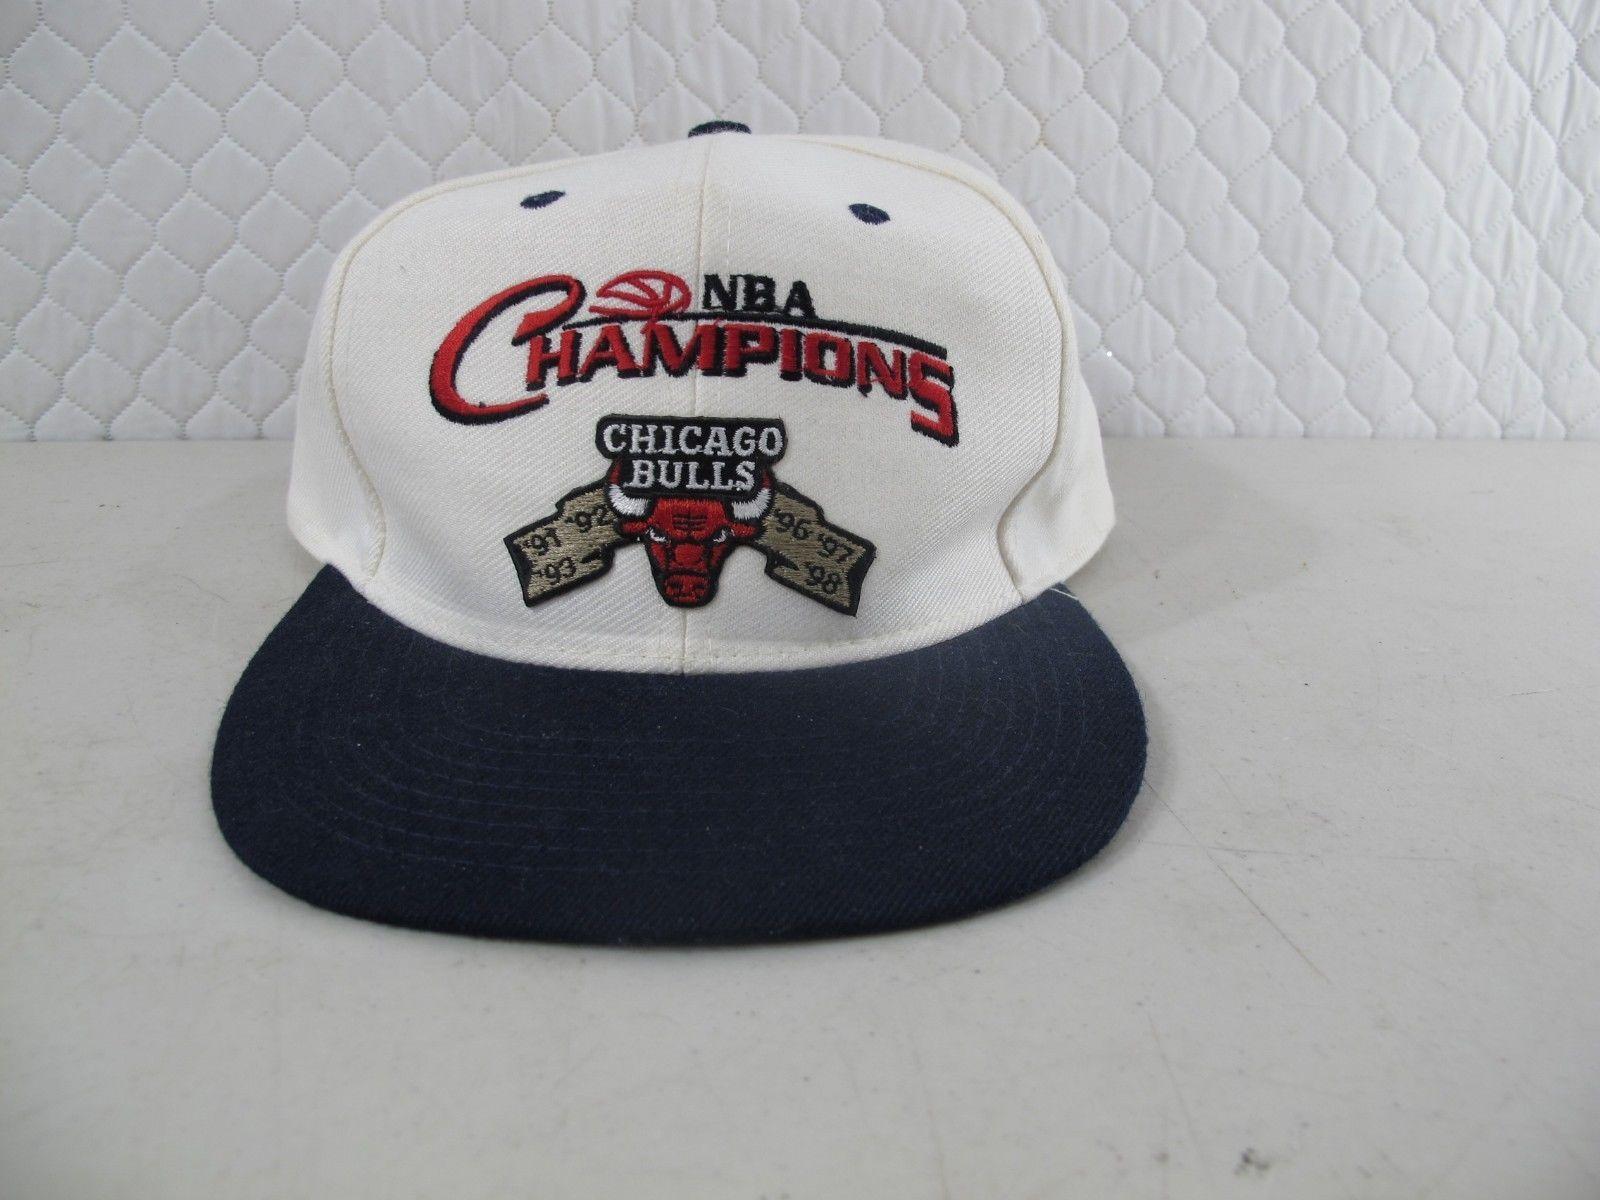 8bcfb1afc94 Chicago Bulls Nba Champions Cap 91 92 93 96 and 21 similar items. 57